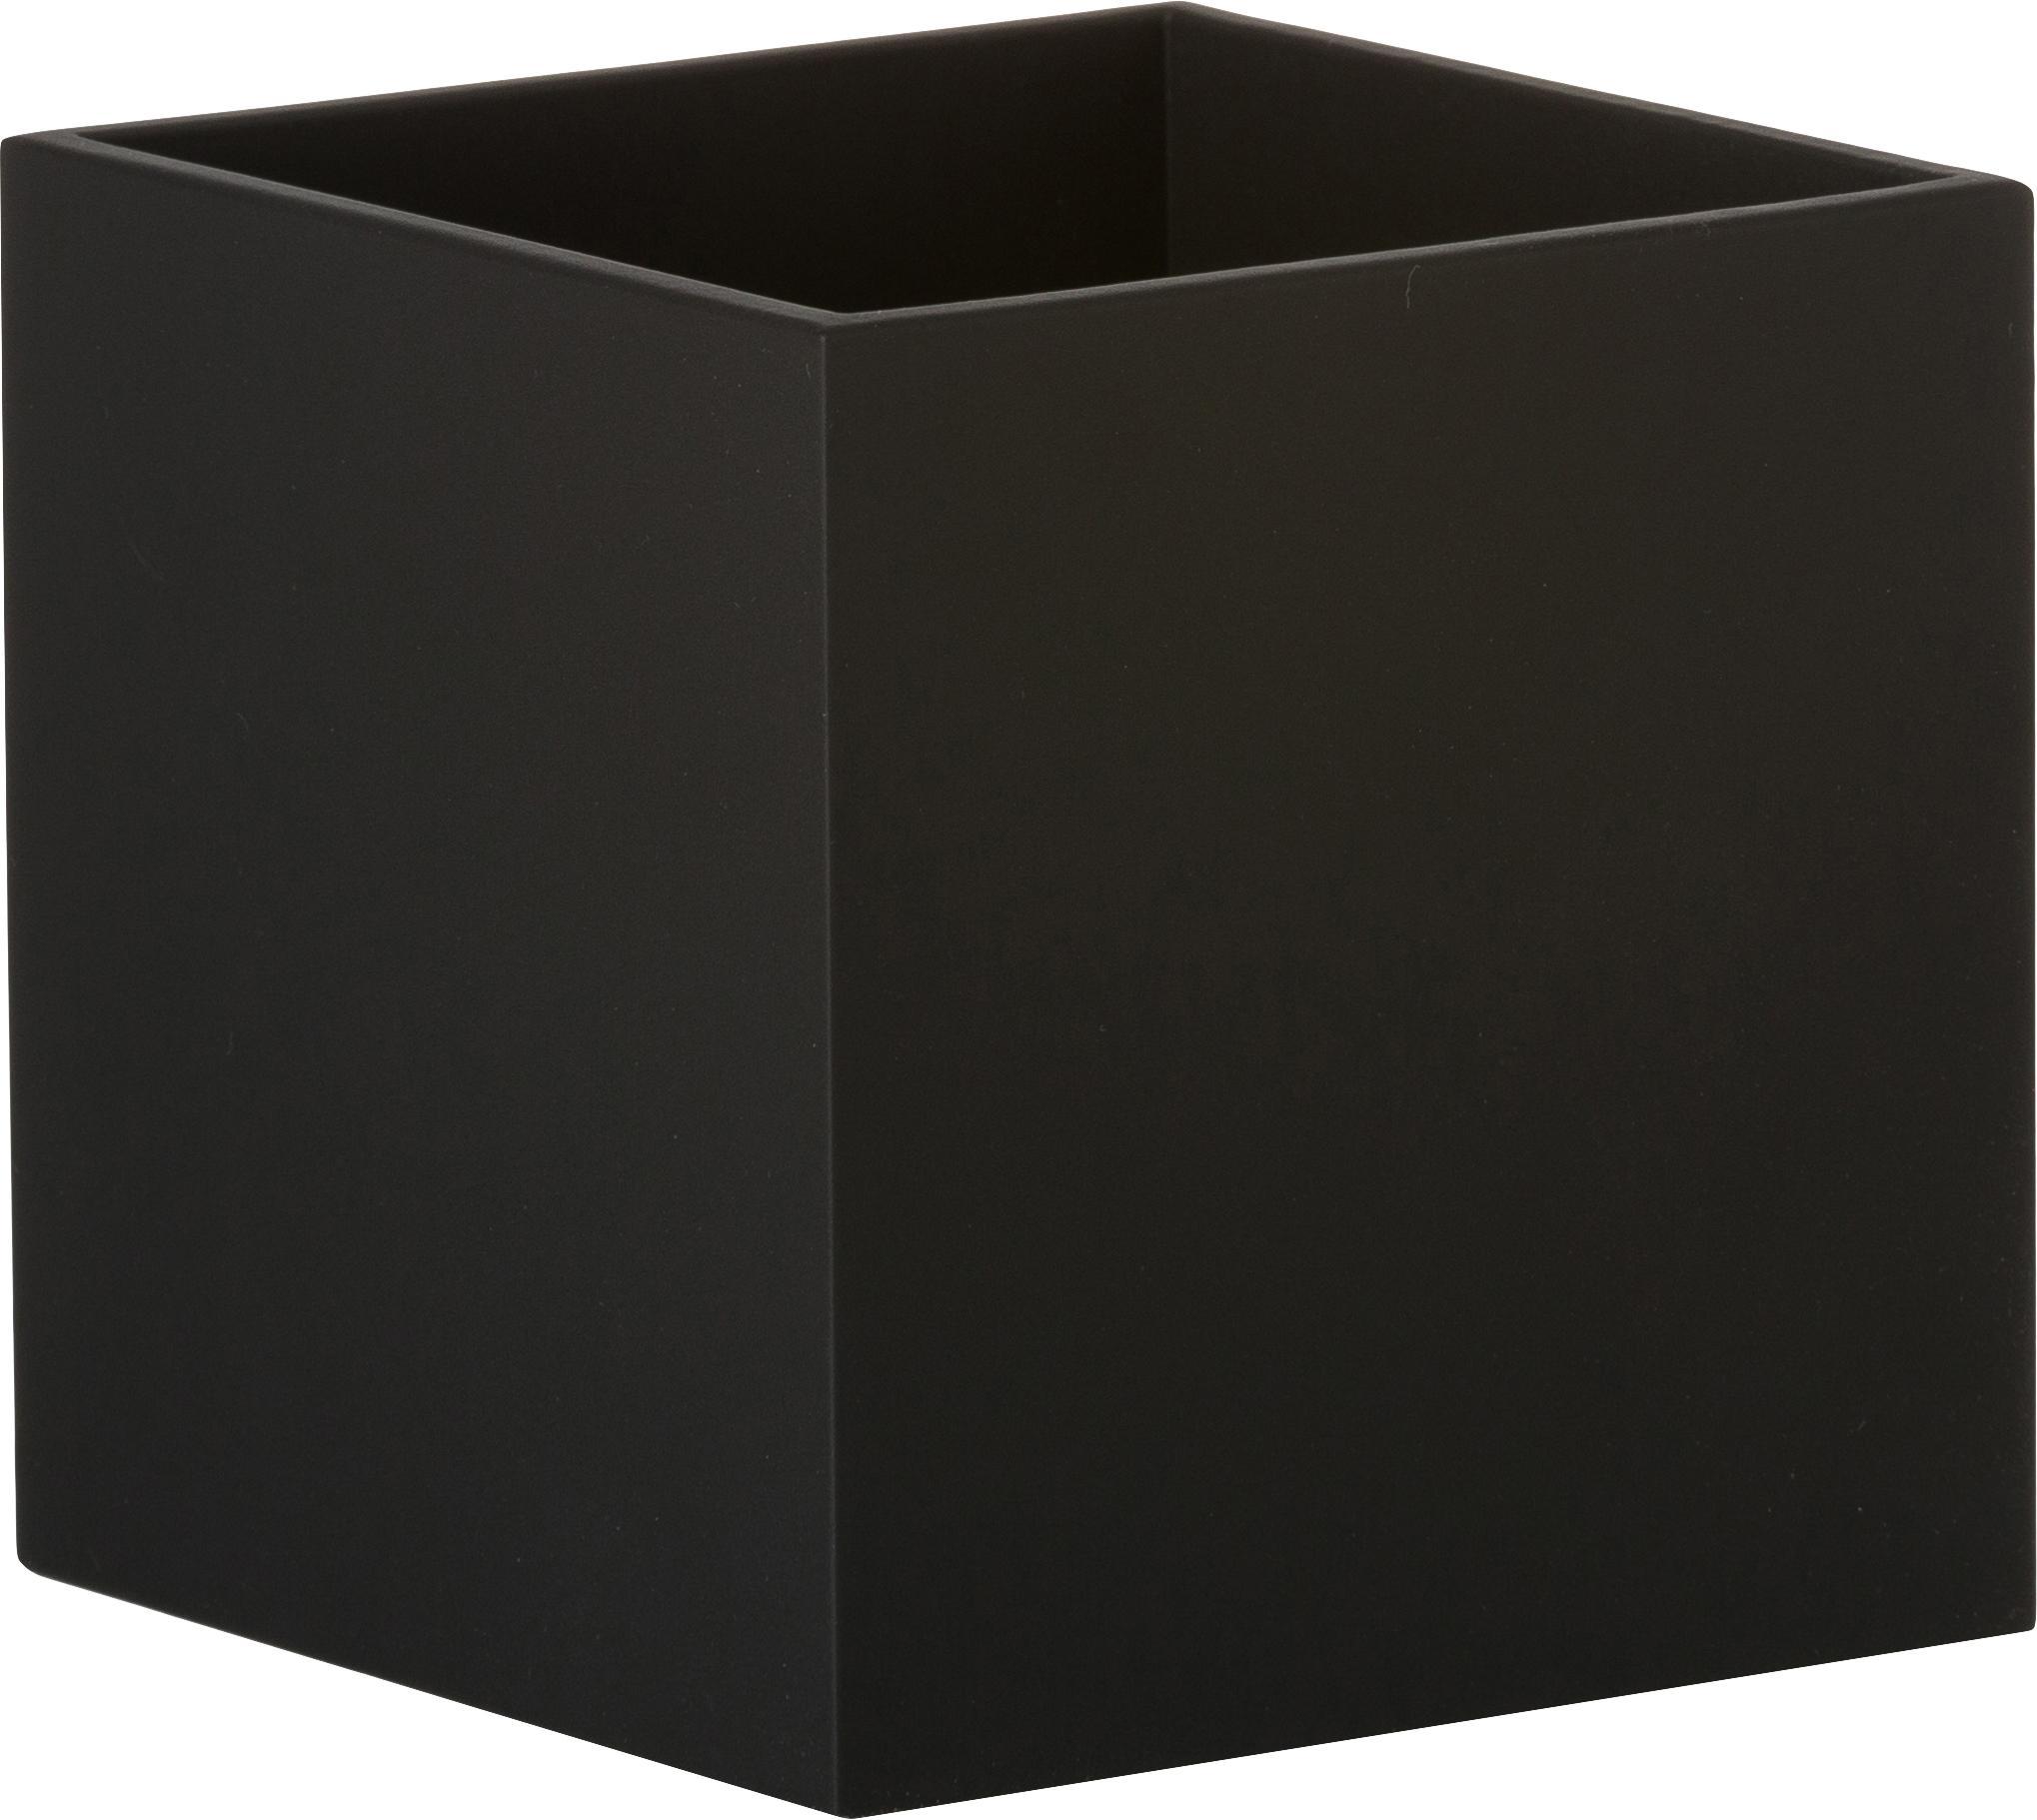 Aplique Quad, Aluminio con pintura en polvo, Negro, An 10 x Al 10 cm